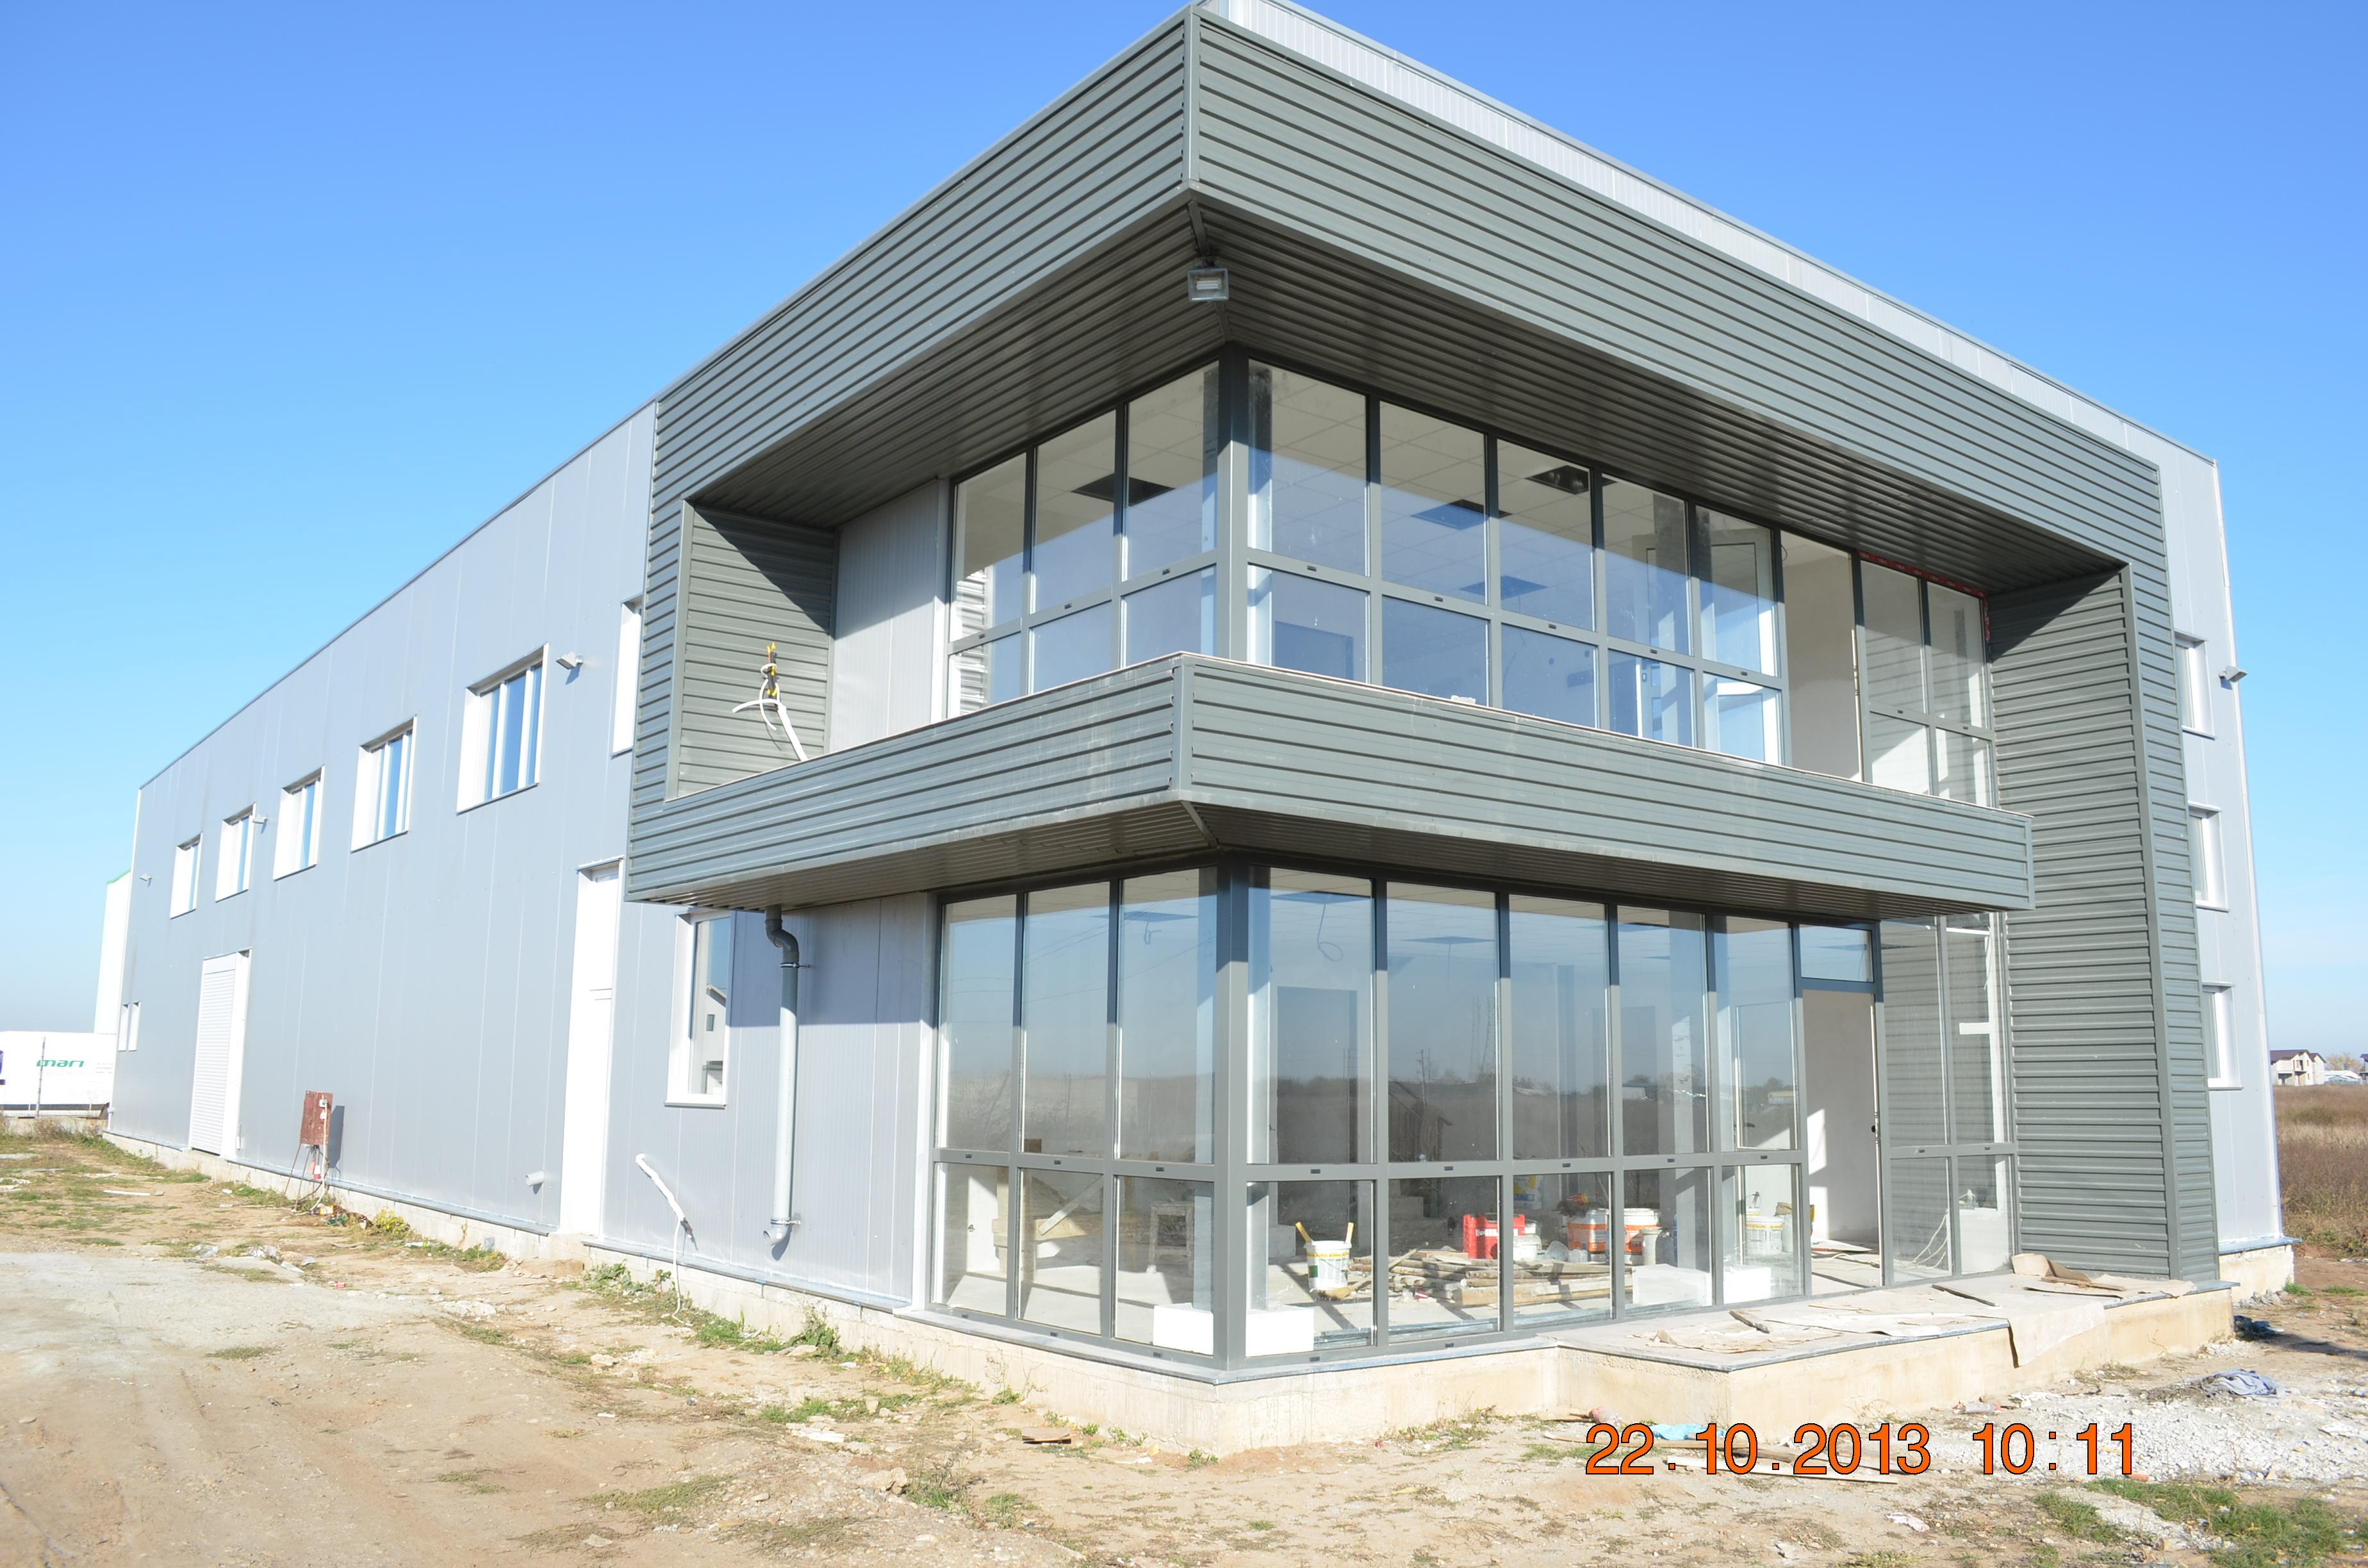 Produktions- und Bürohalle Gemeinde Cârcea, Kreis Dolj